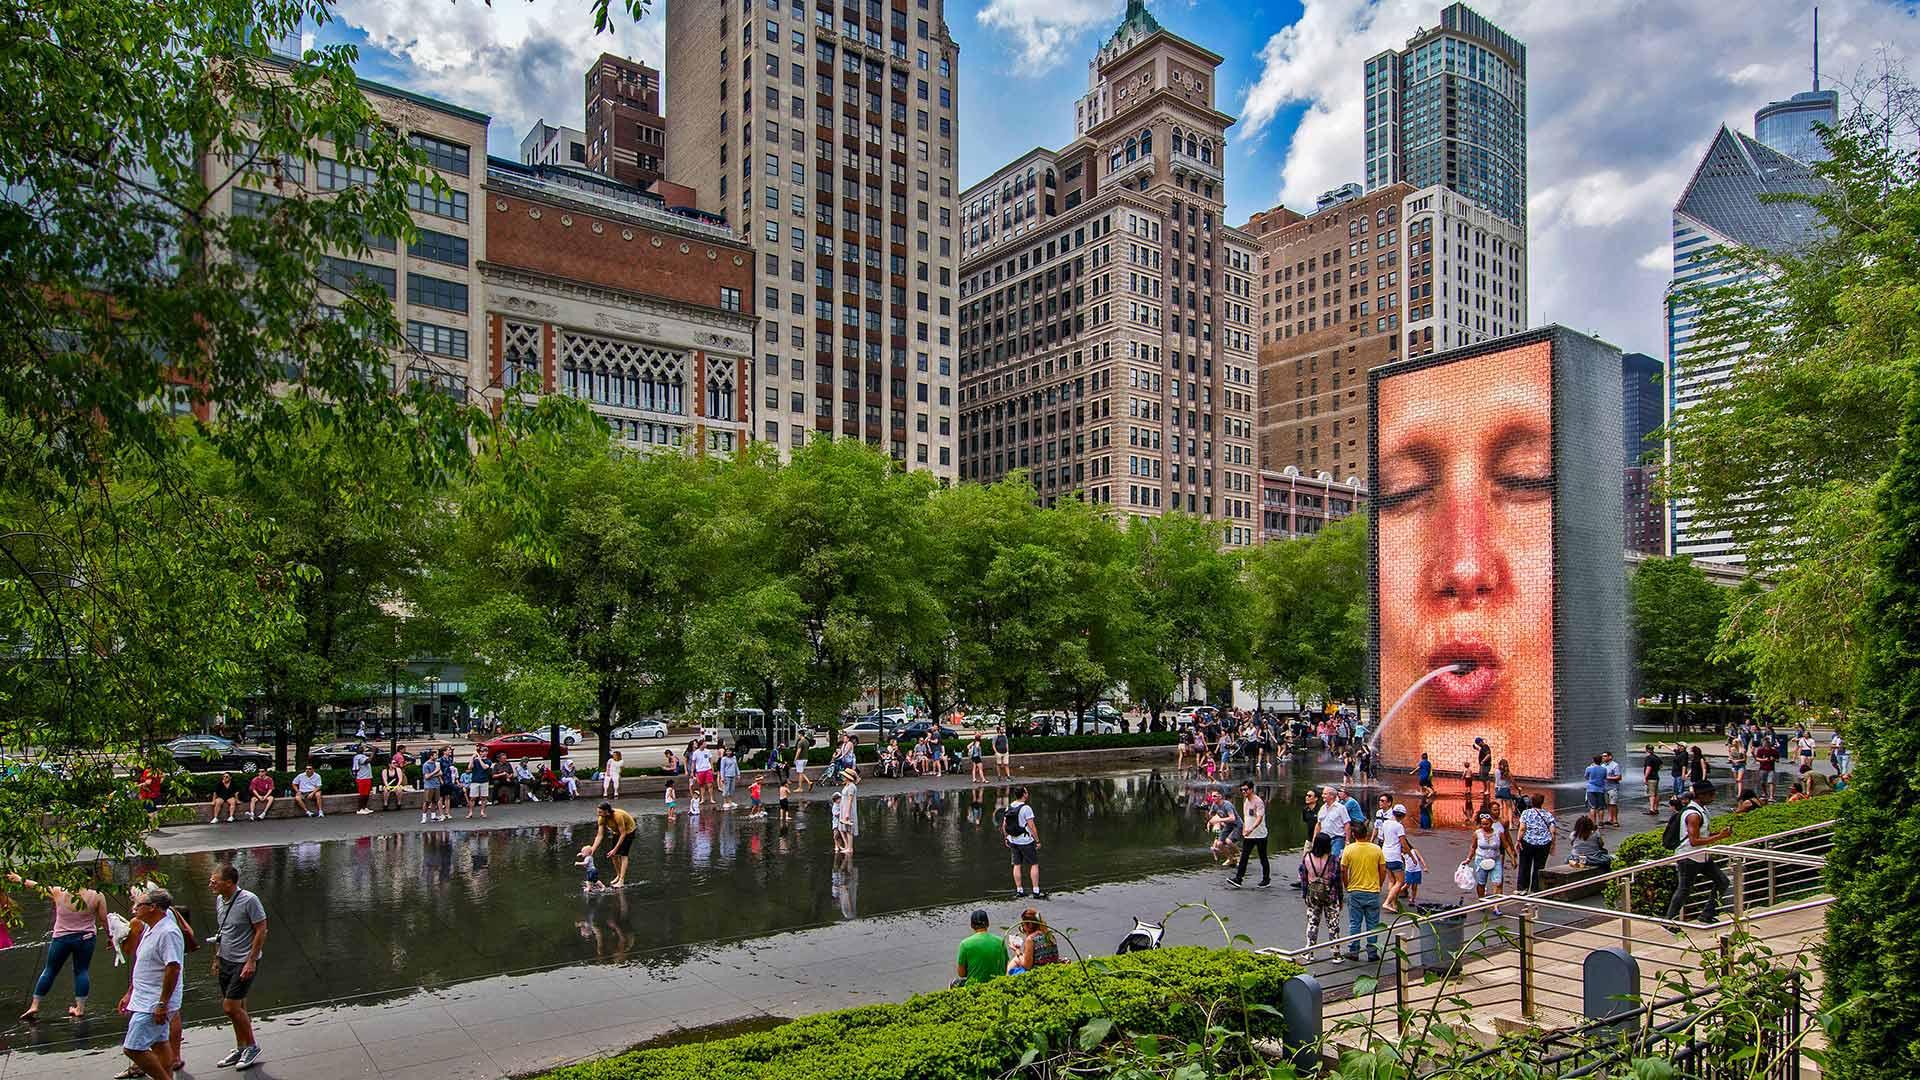 'Crown Fountain' Illinois, Chicago, USA (© imageBROKER / Alamy)